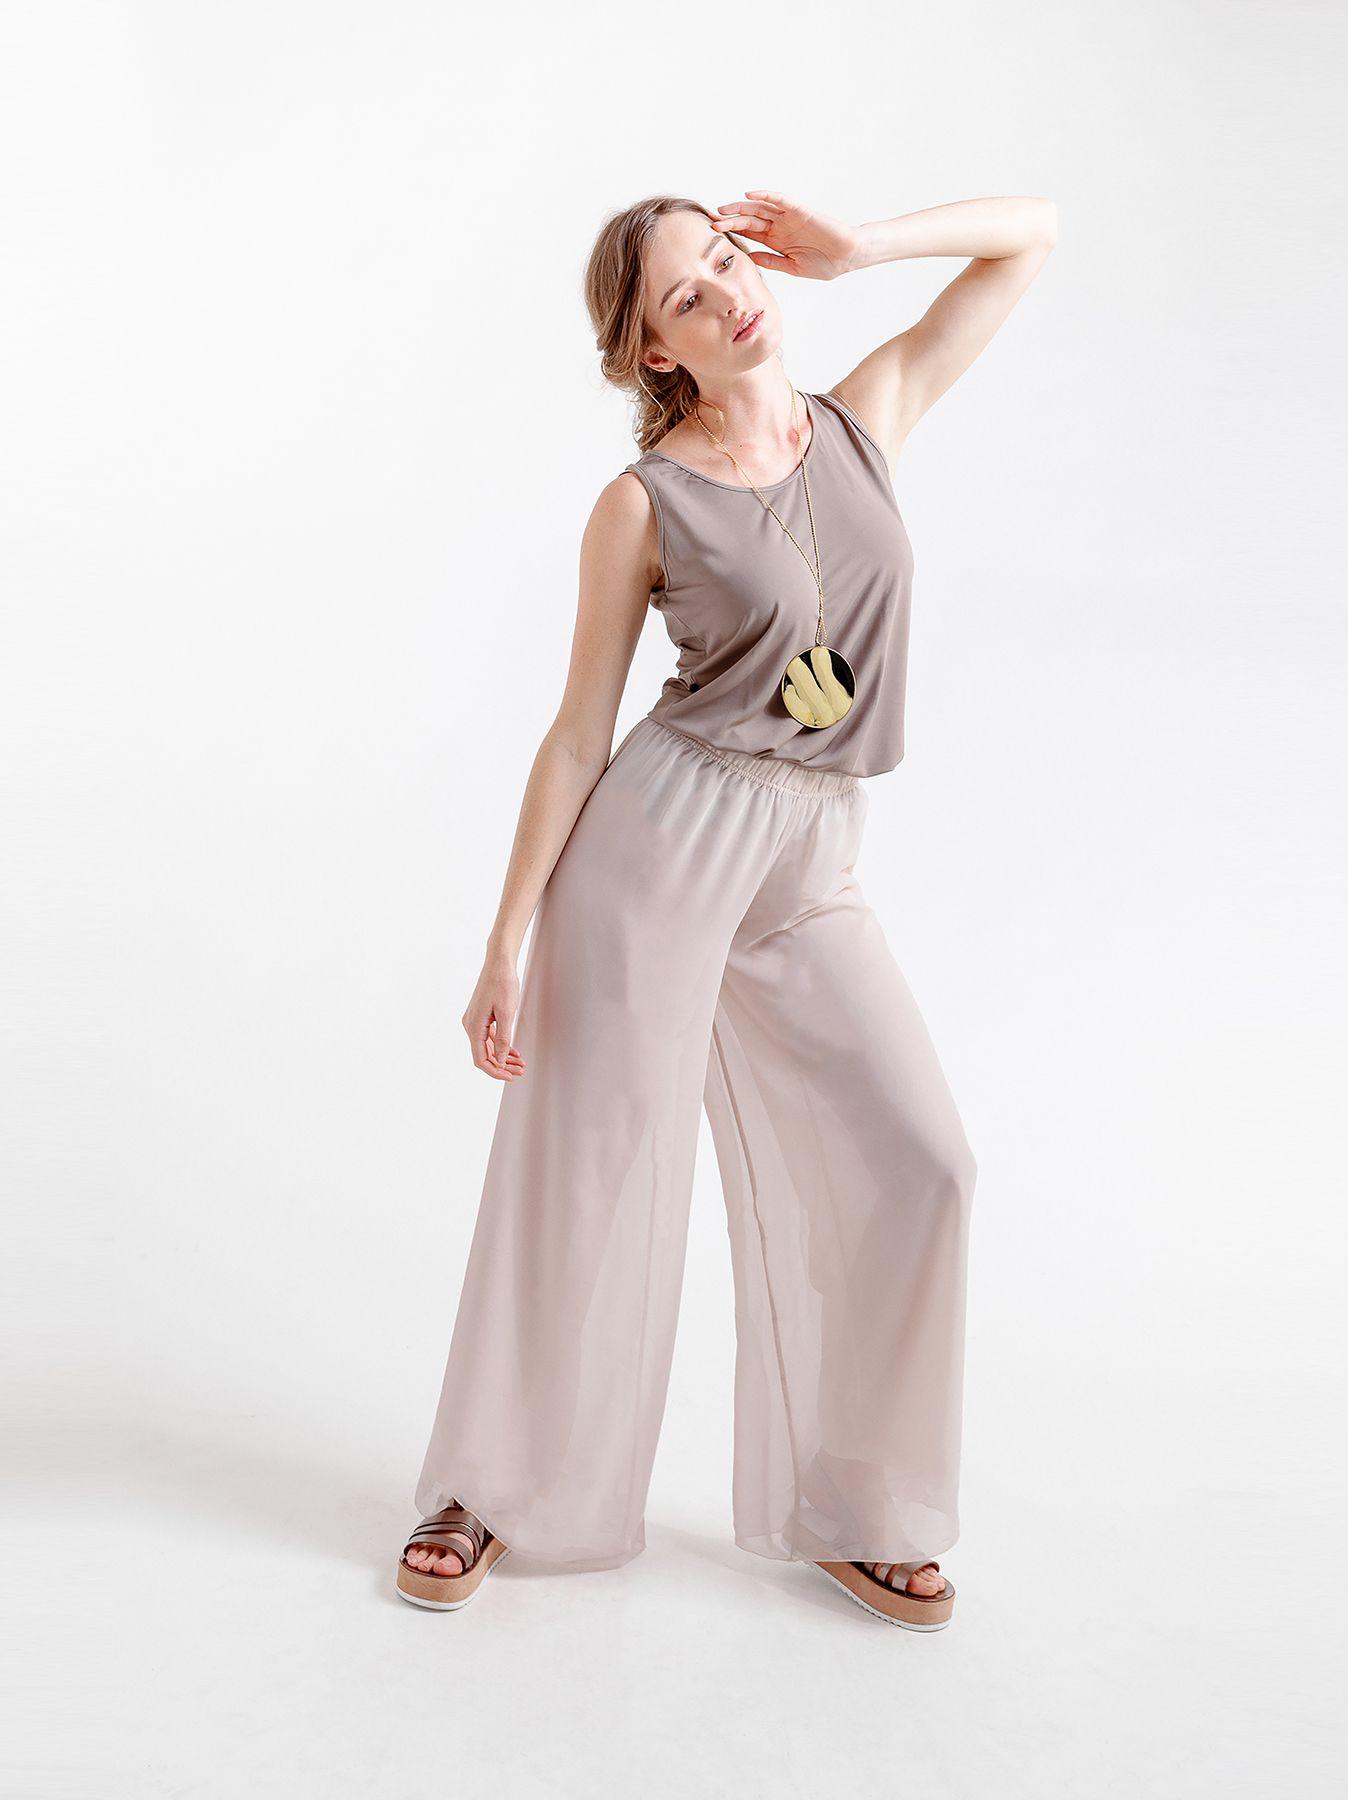 Pantalone elastico in chiffon